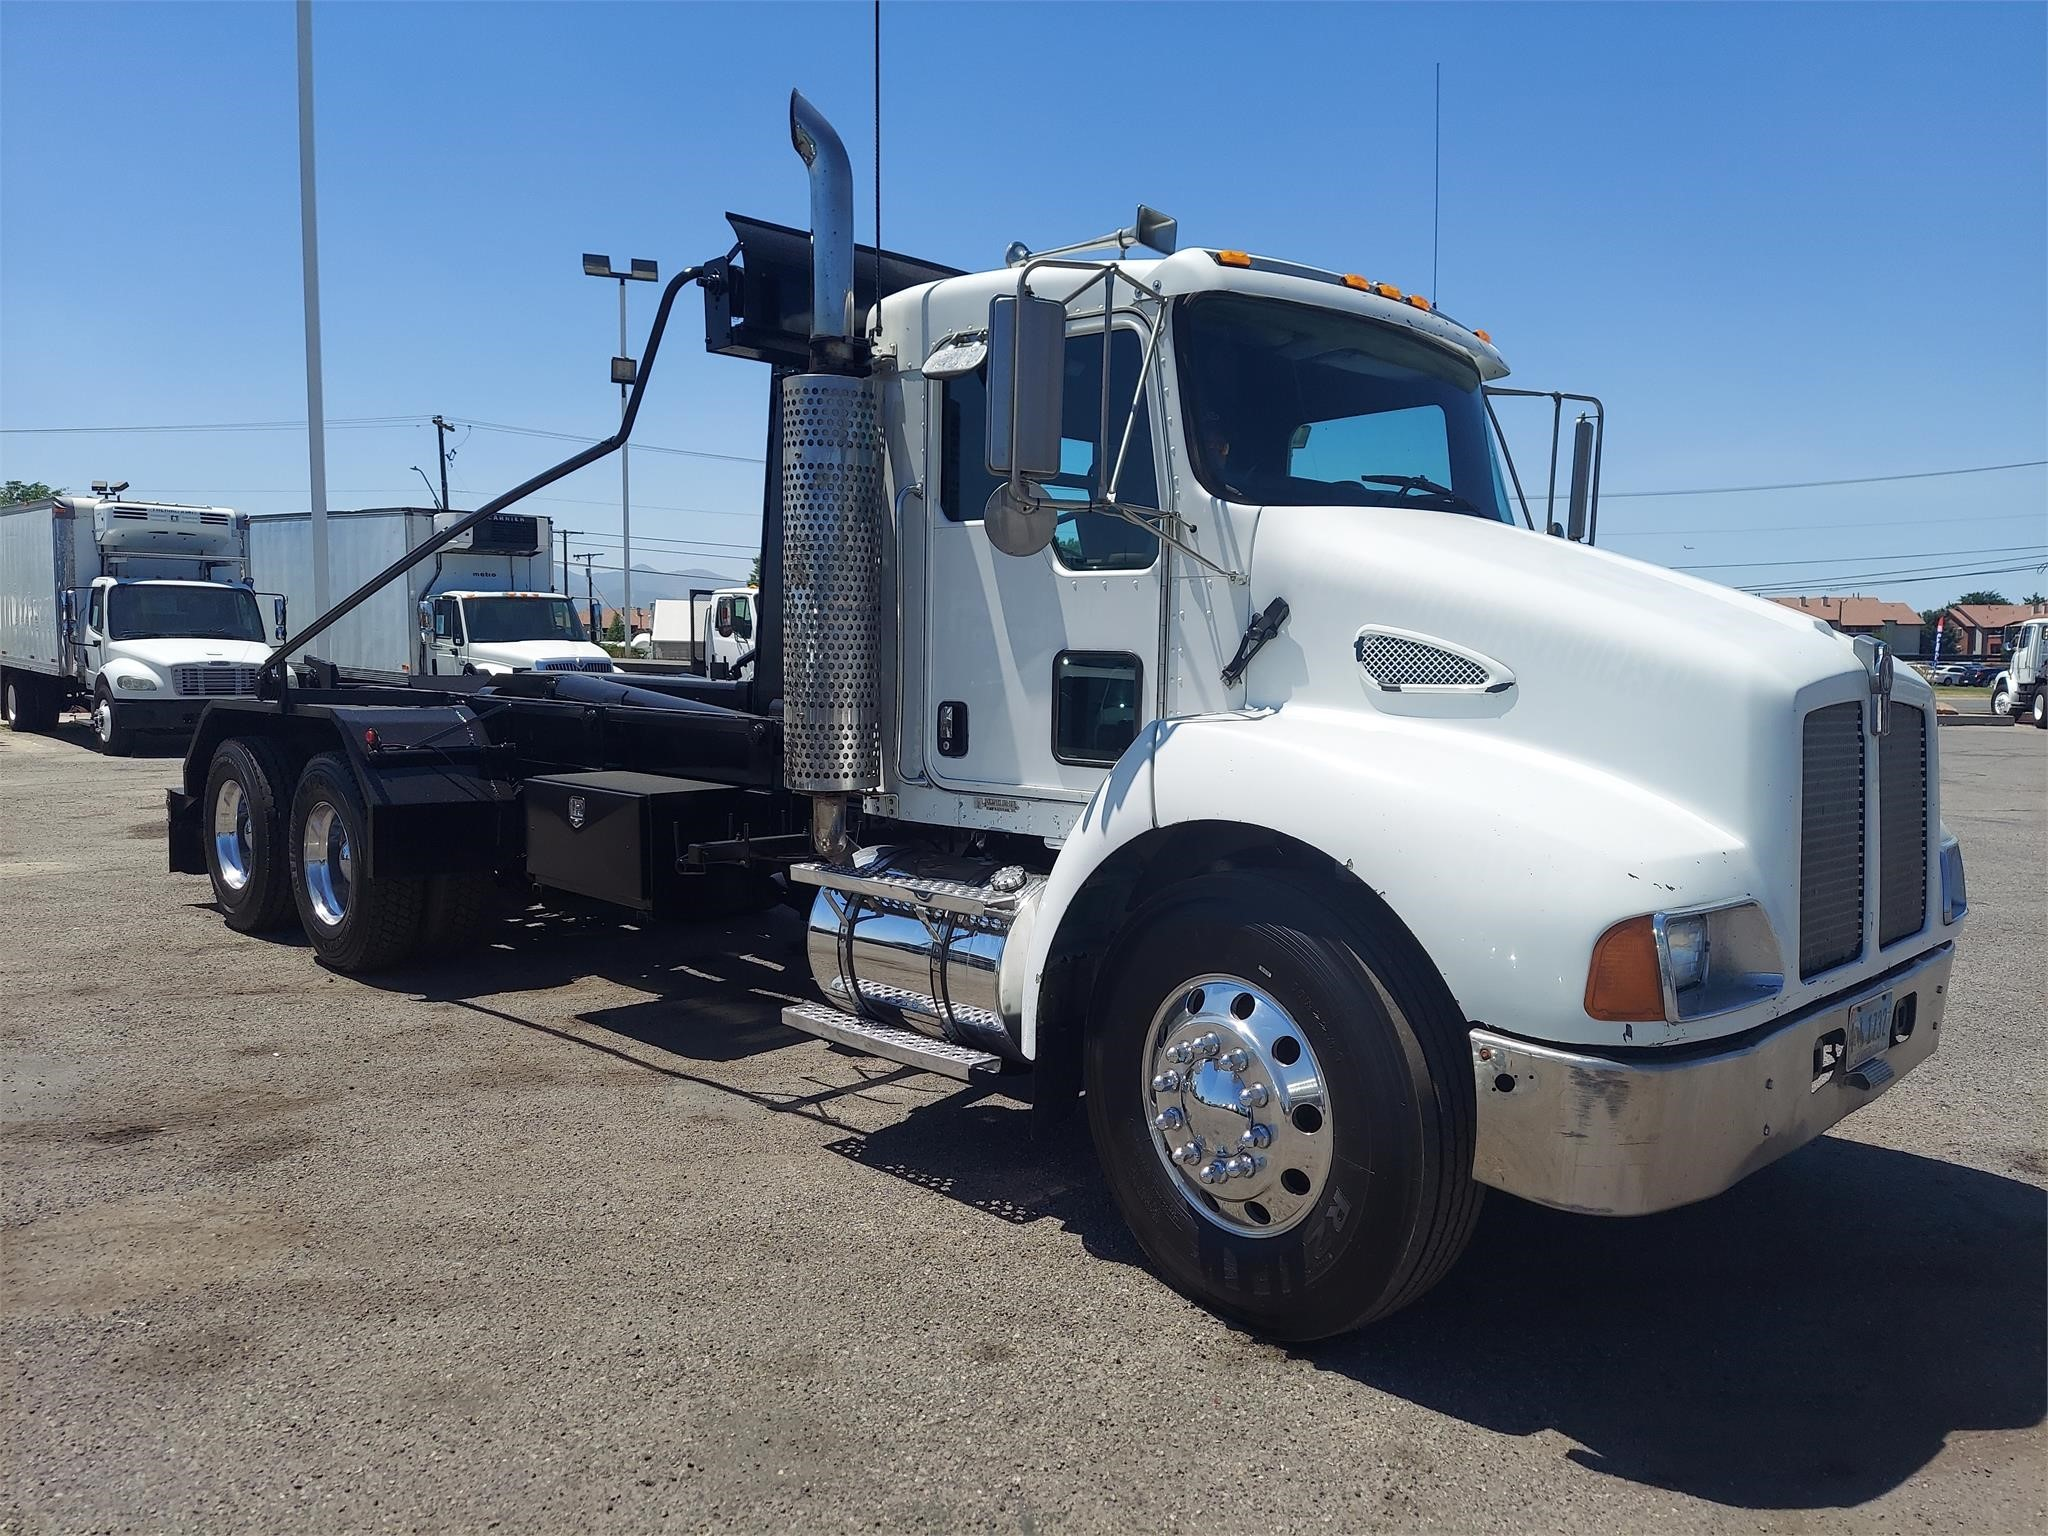 Used, 2003, KENWORTH, T300, Hooklift Truck